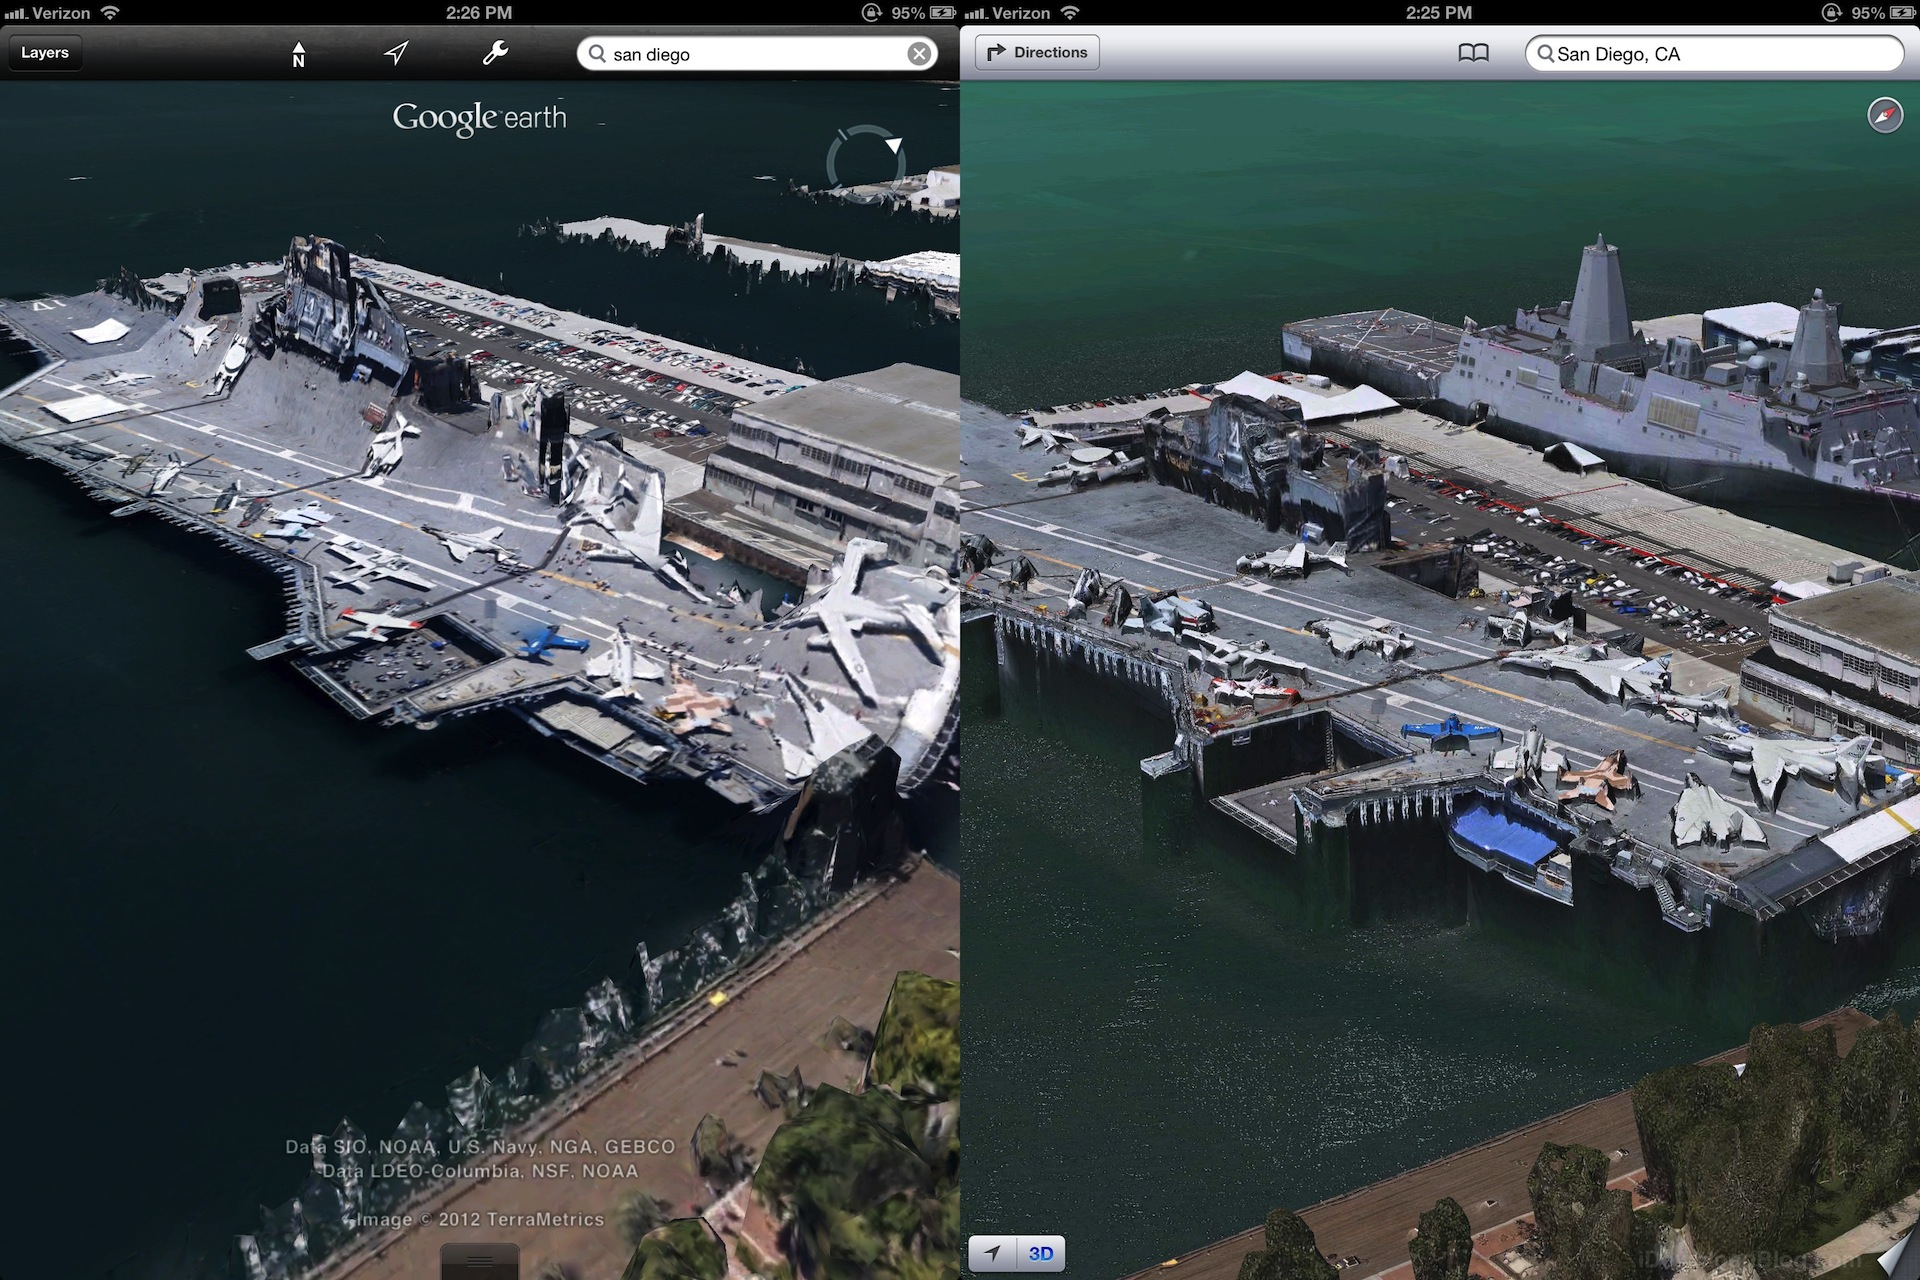 Apple's 3D maps look much better than Google's